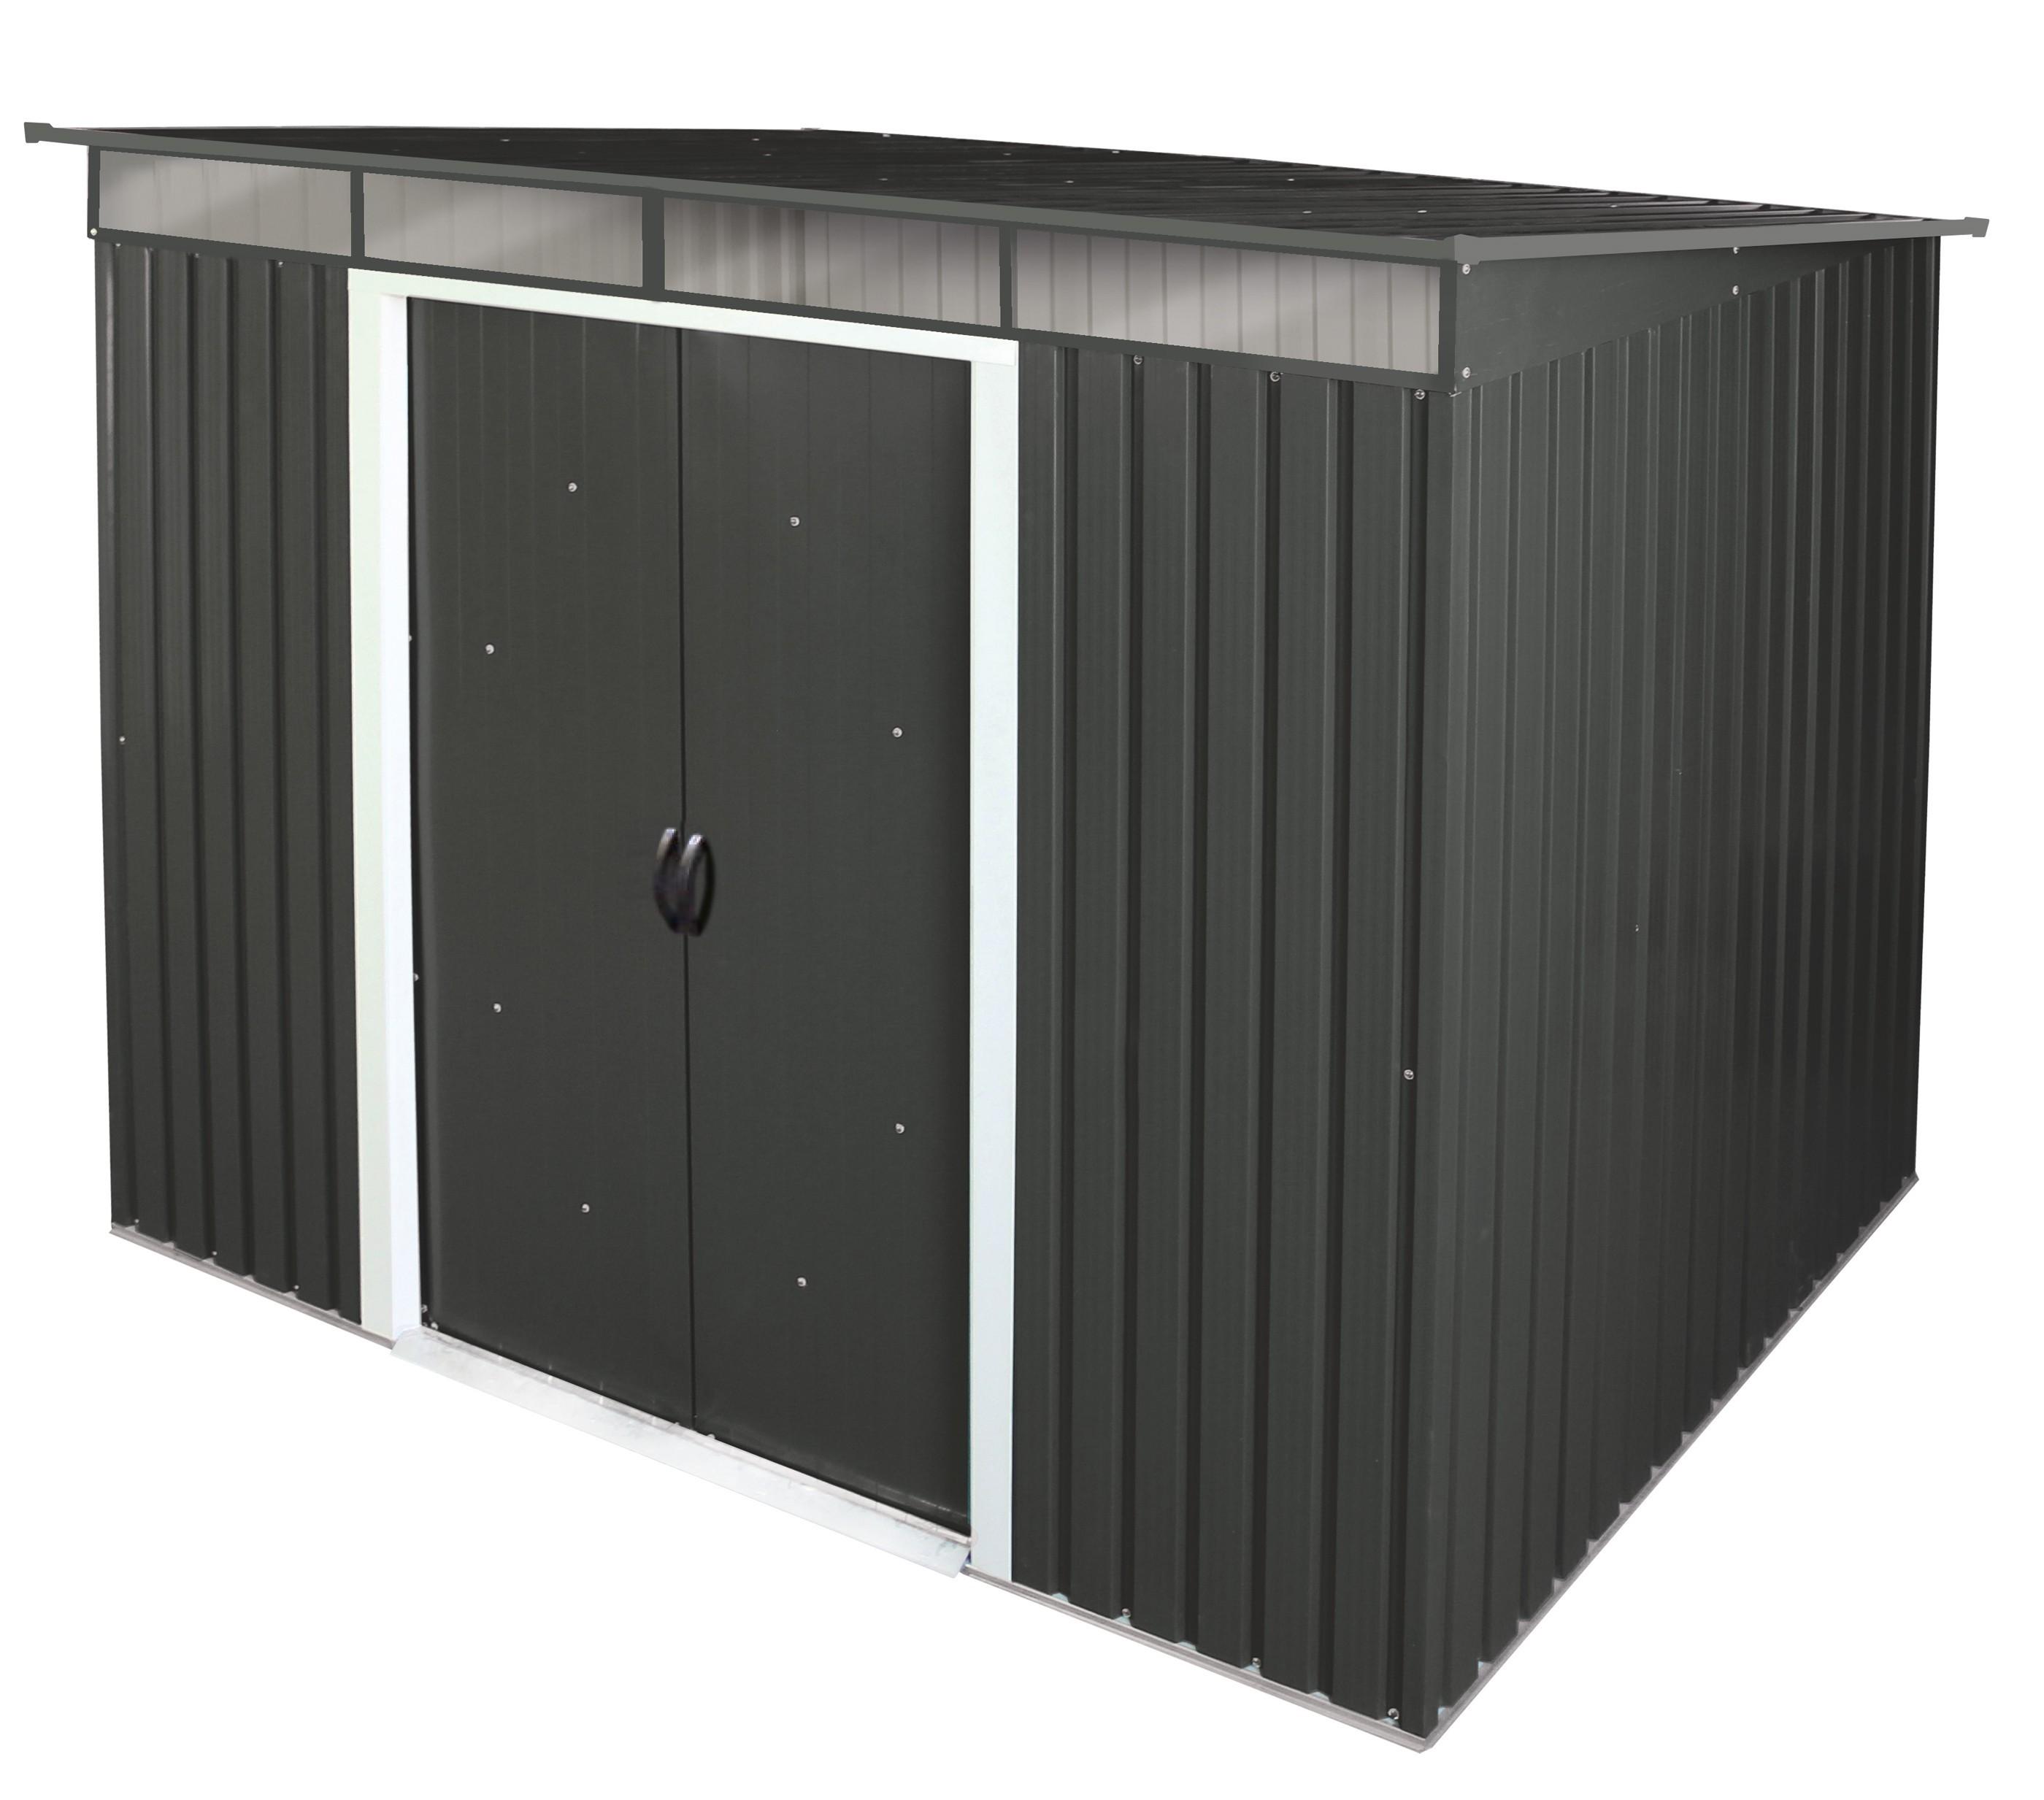 Duramax Gerätehaus Metall Pent Roof Skylight 8x6 anthrazit